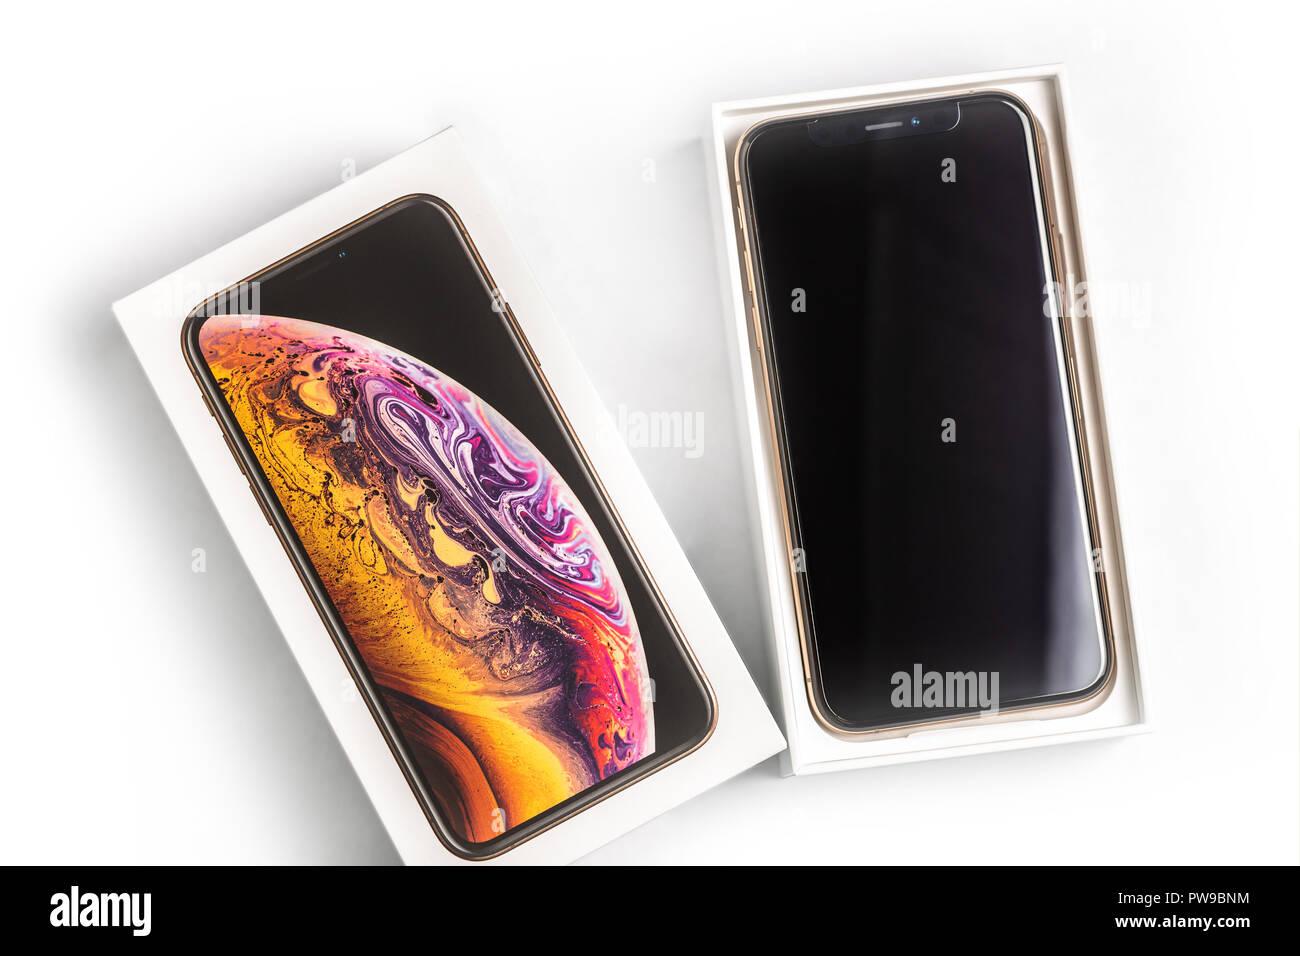 X Smartphone Stock Photos & X Smartphone Stock Images - Alamy